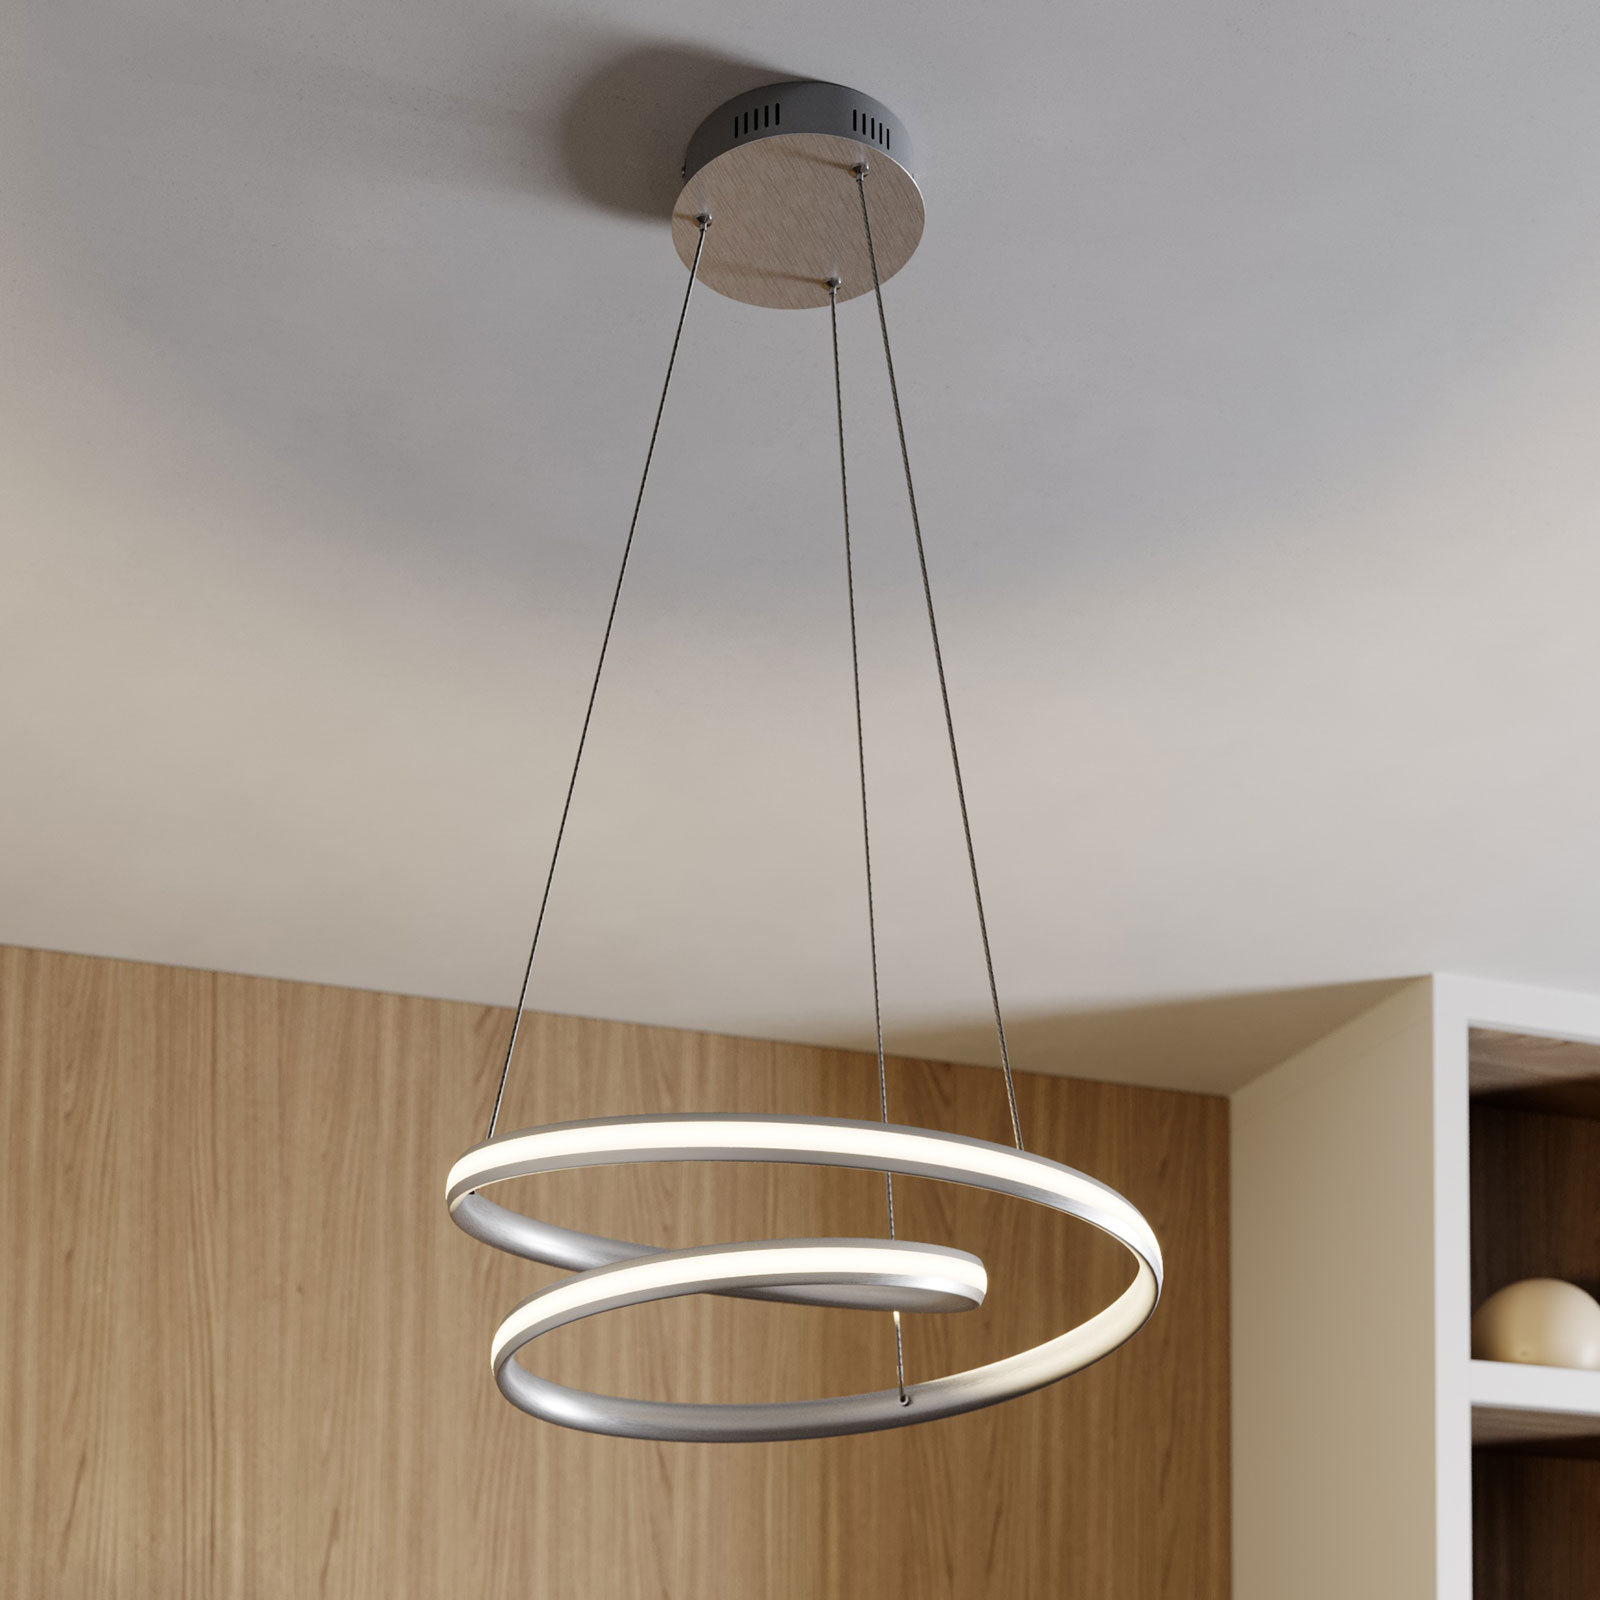 Lindby Smart Verio -LED-riippuvalo, korkeus 16 cm